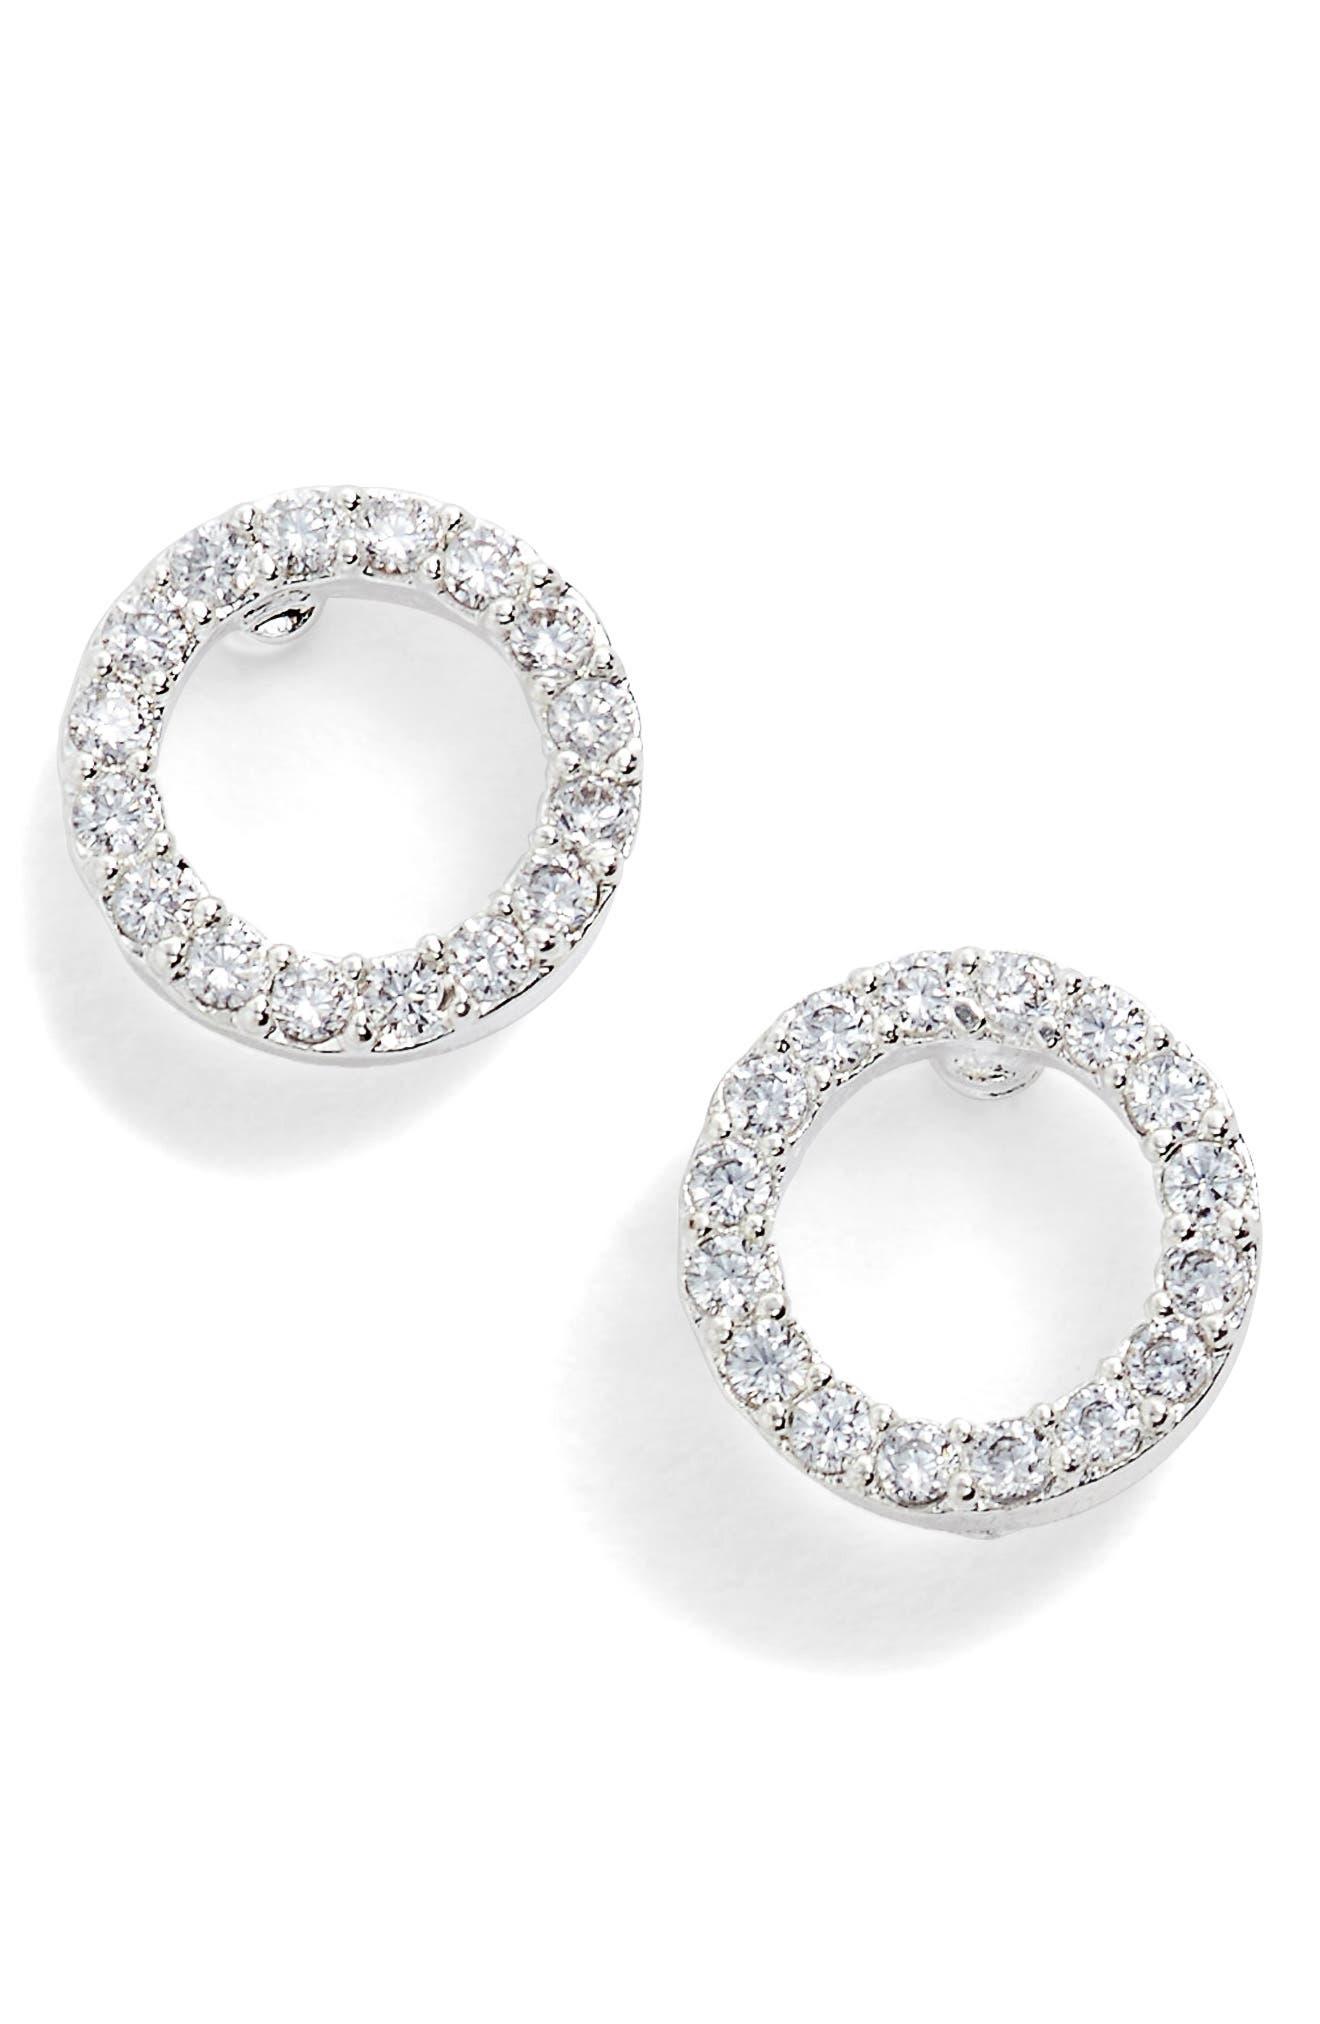 Cubic Zirconia Circle Earrings,                             Alternate thumbnail 3, color,                             040